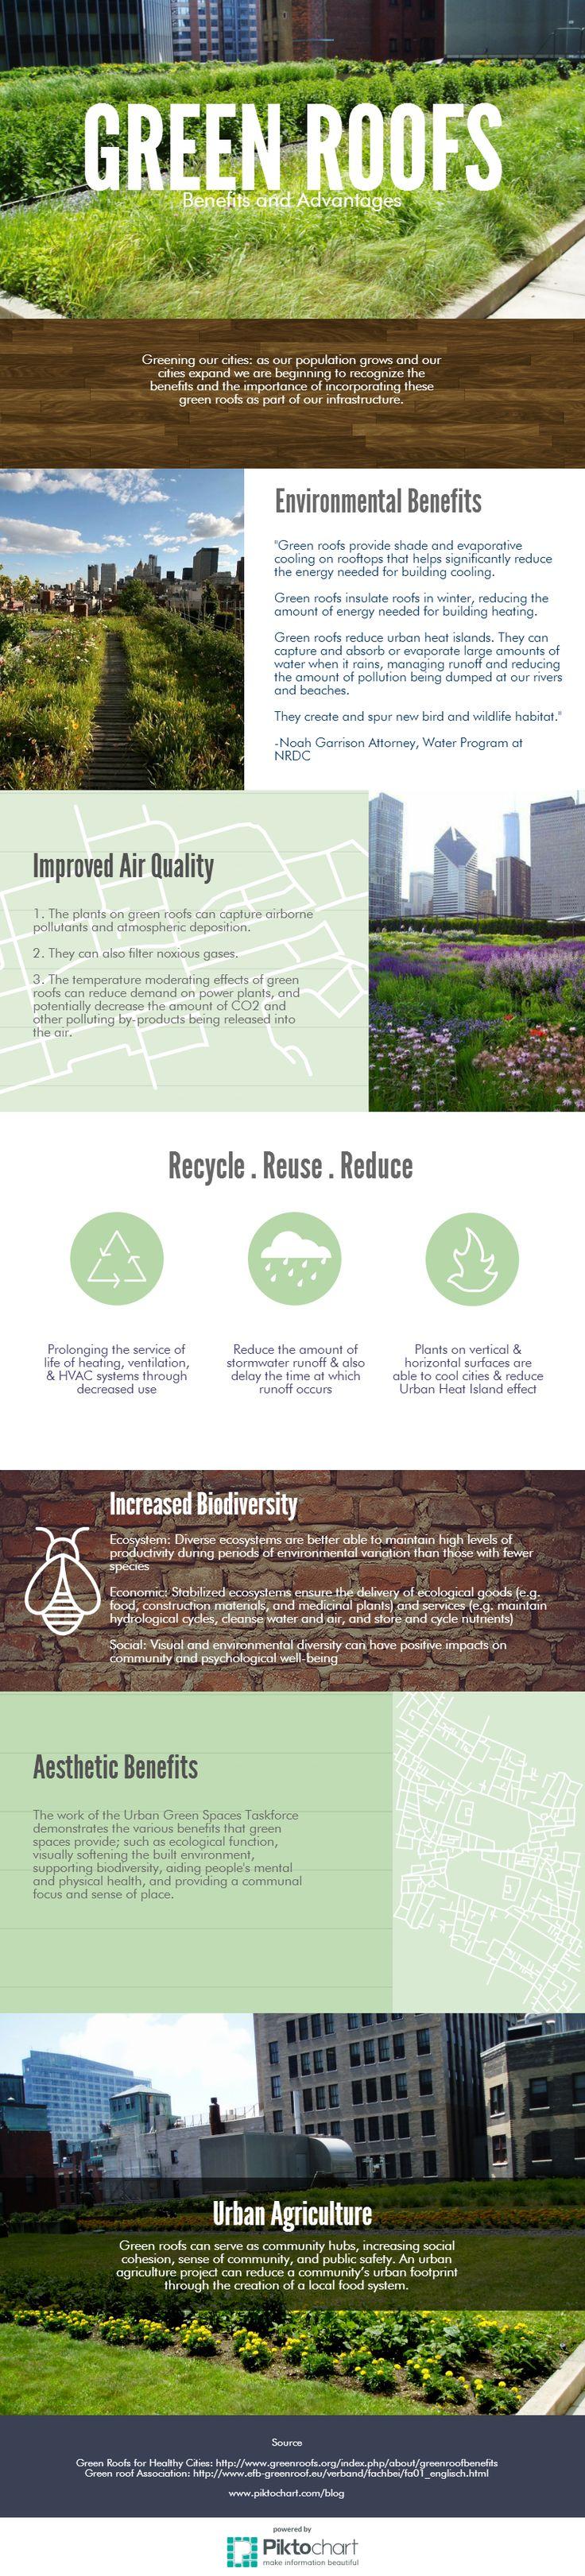 best 25 green roofs ideas on pinterest green roof. Black Bedroom Furniture Sets. Home Design Ideas